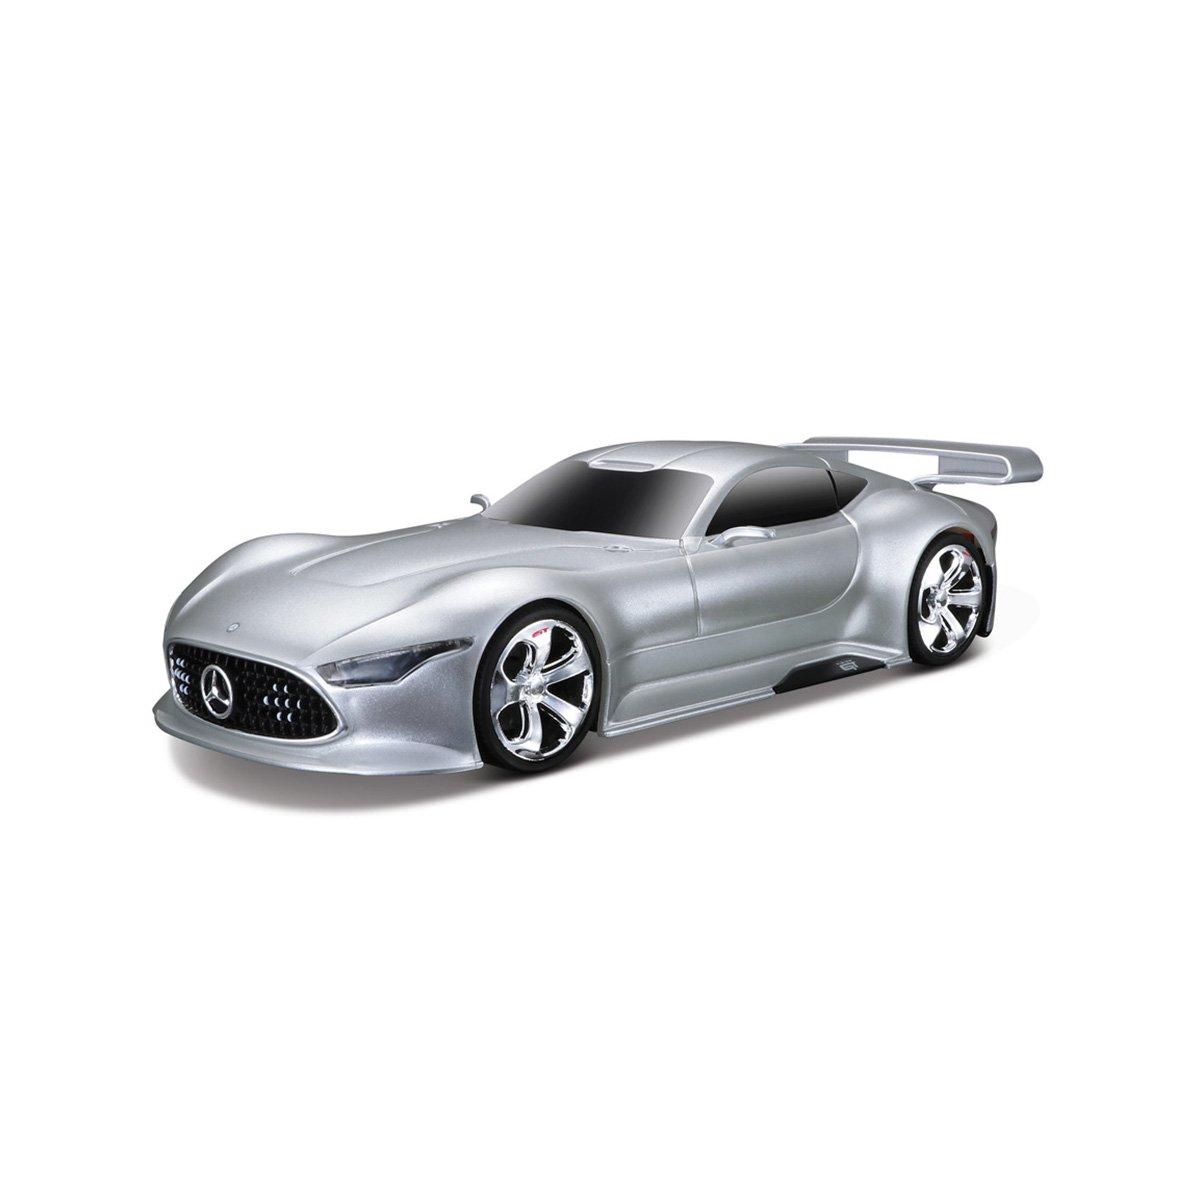 Masinuta Maisto Mercedes Benz Gran Turismo, 1:32, Gri